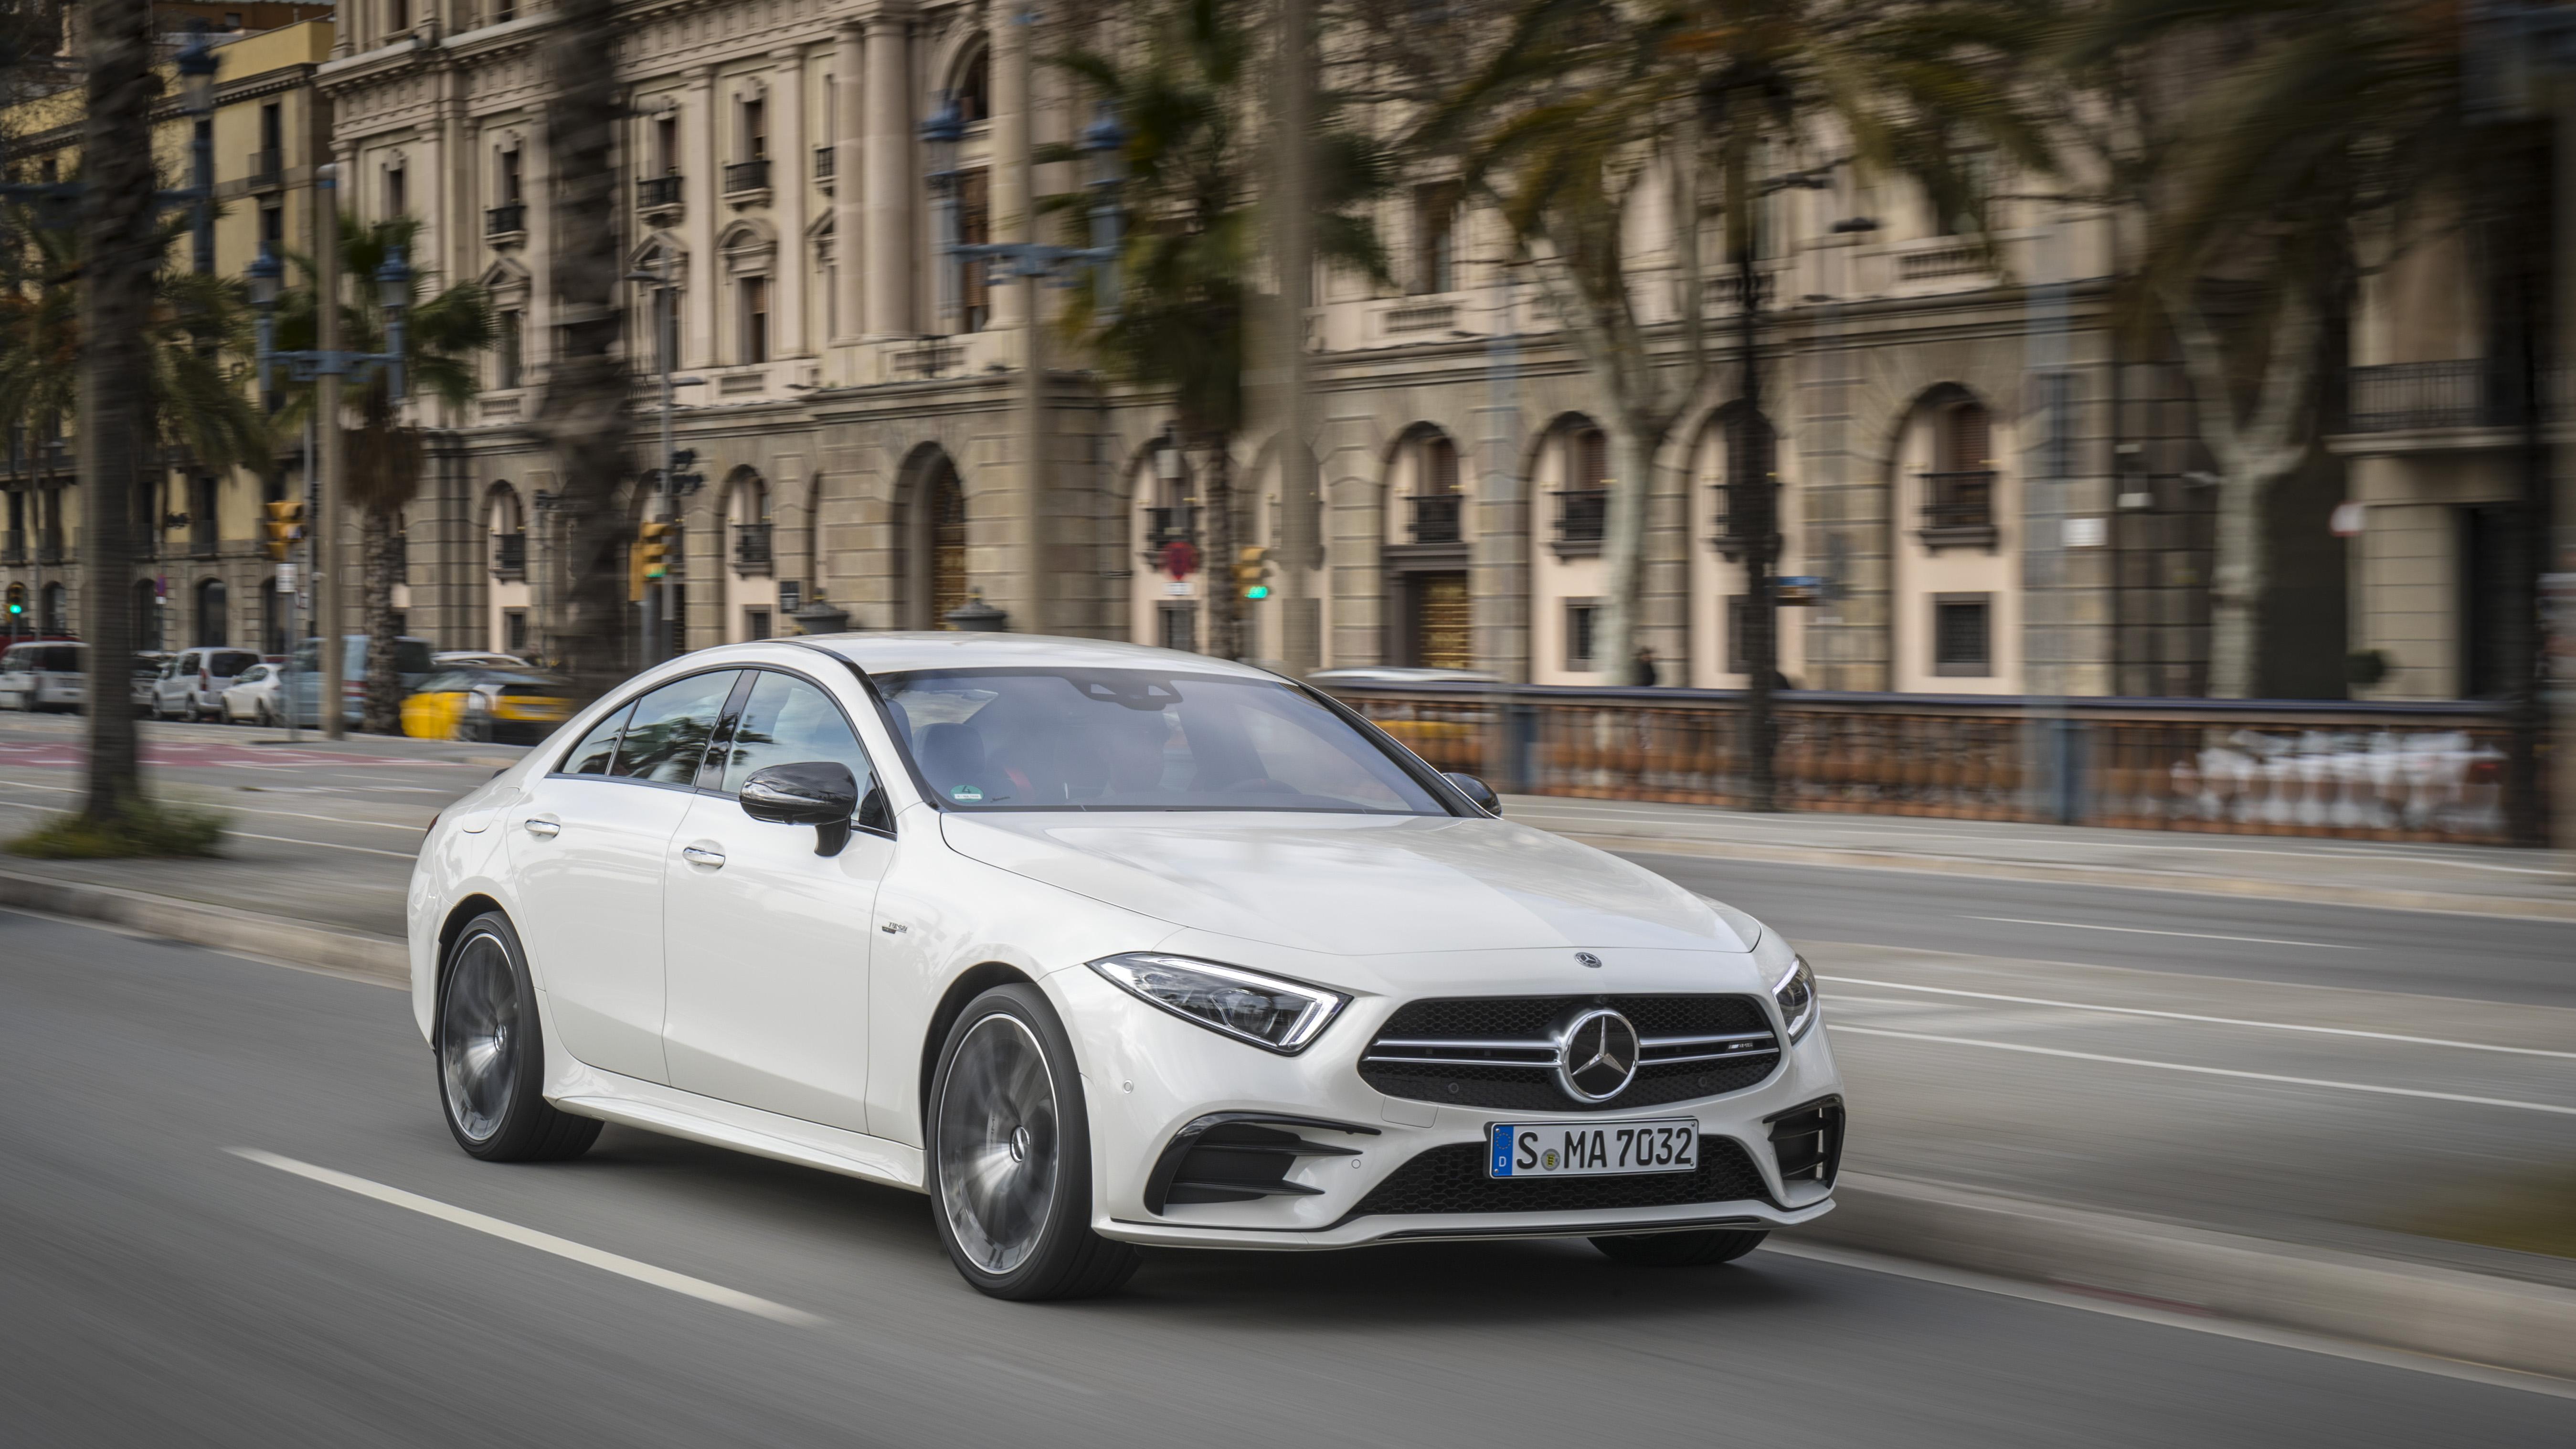 2018 Mercedes-Benz CLS first drive review